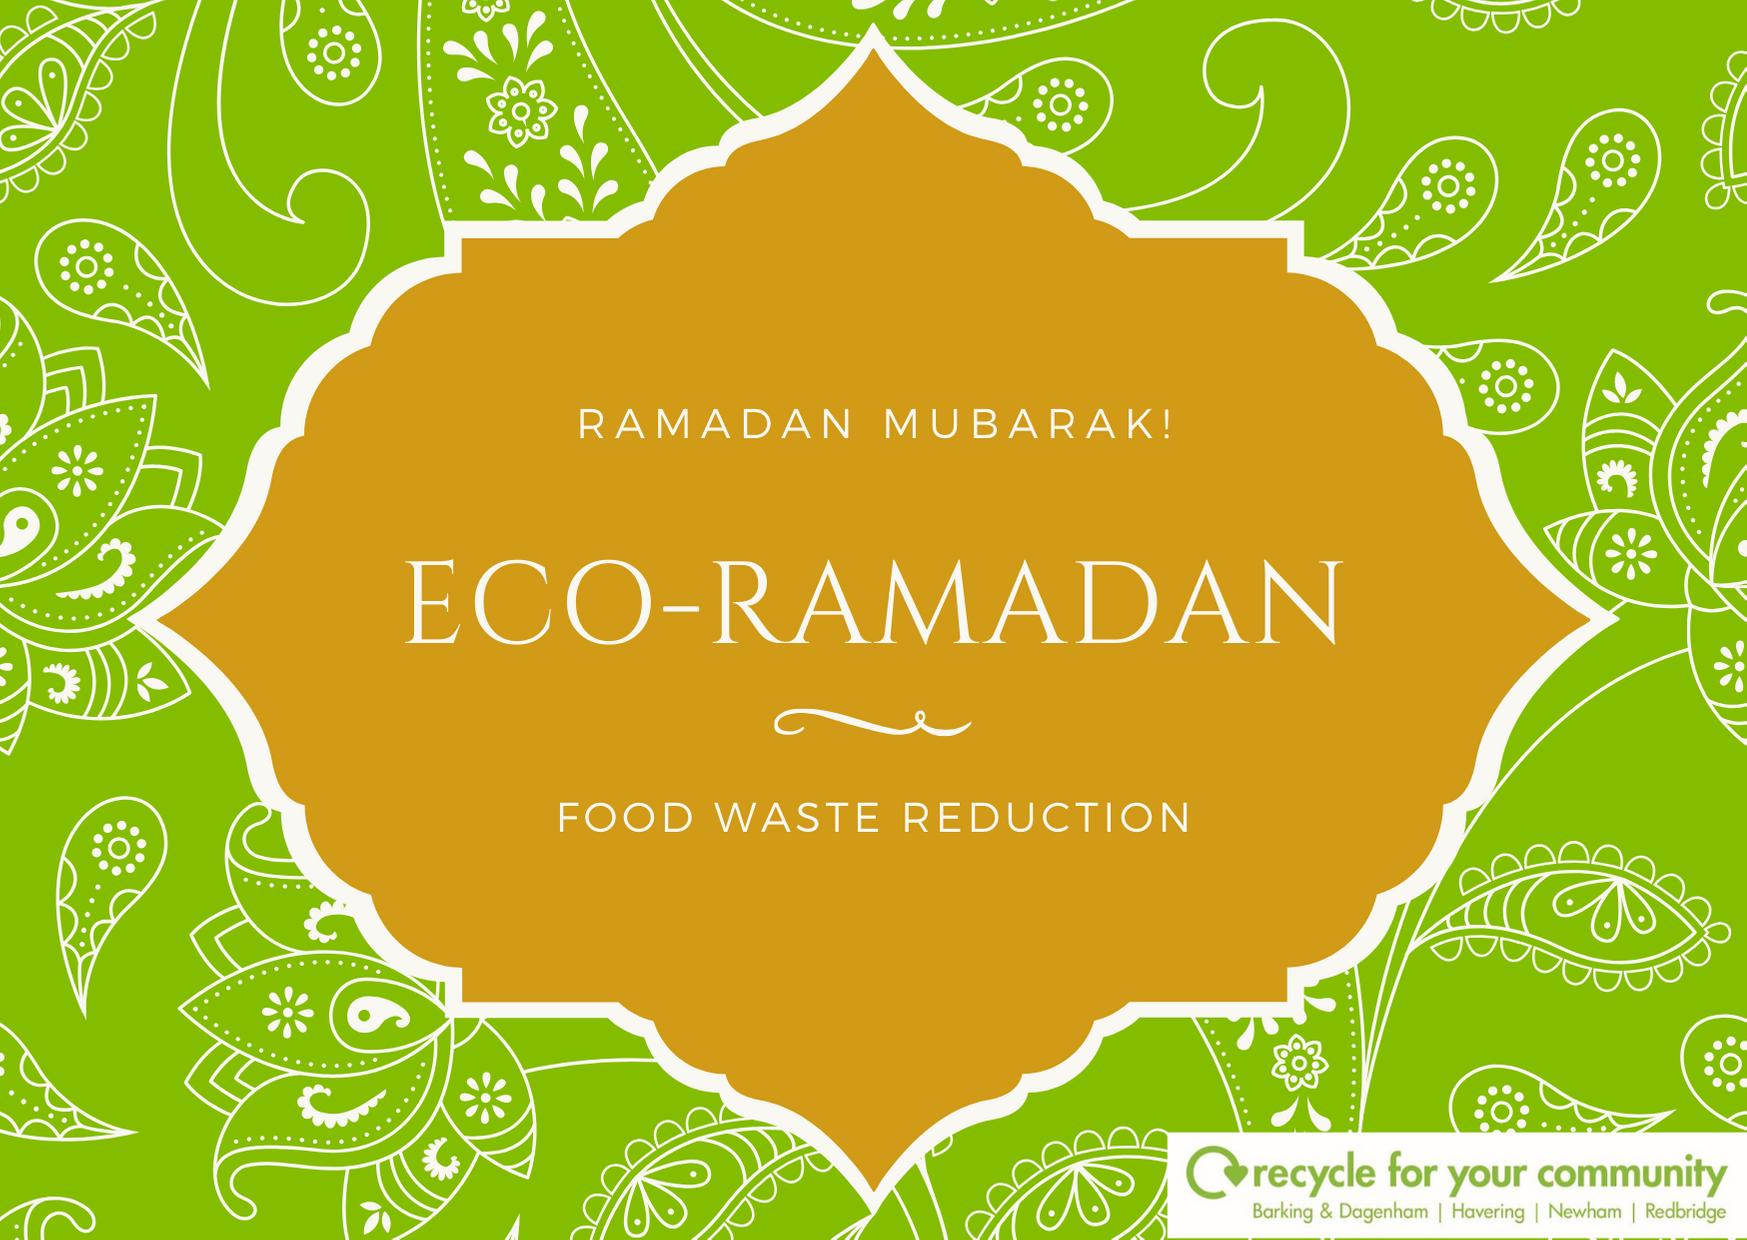 Eco-Ramadan